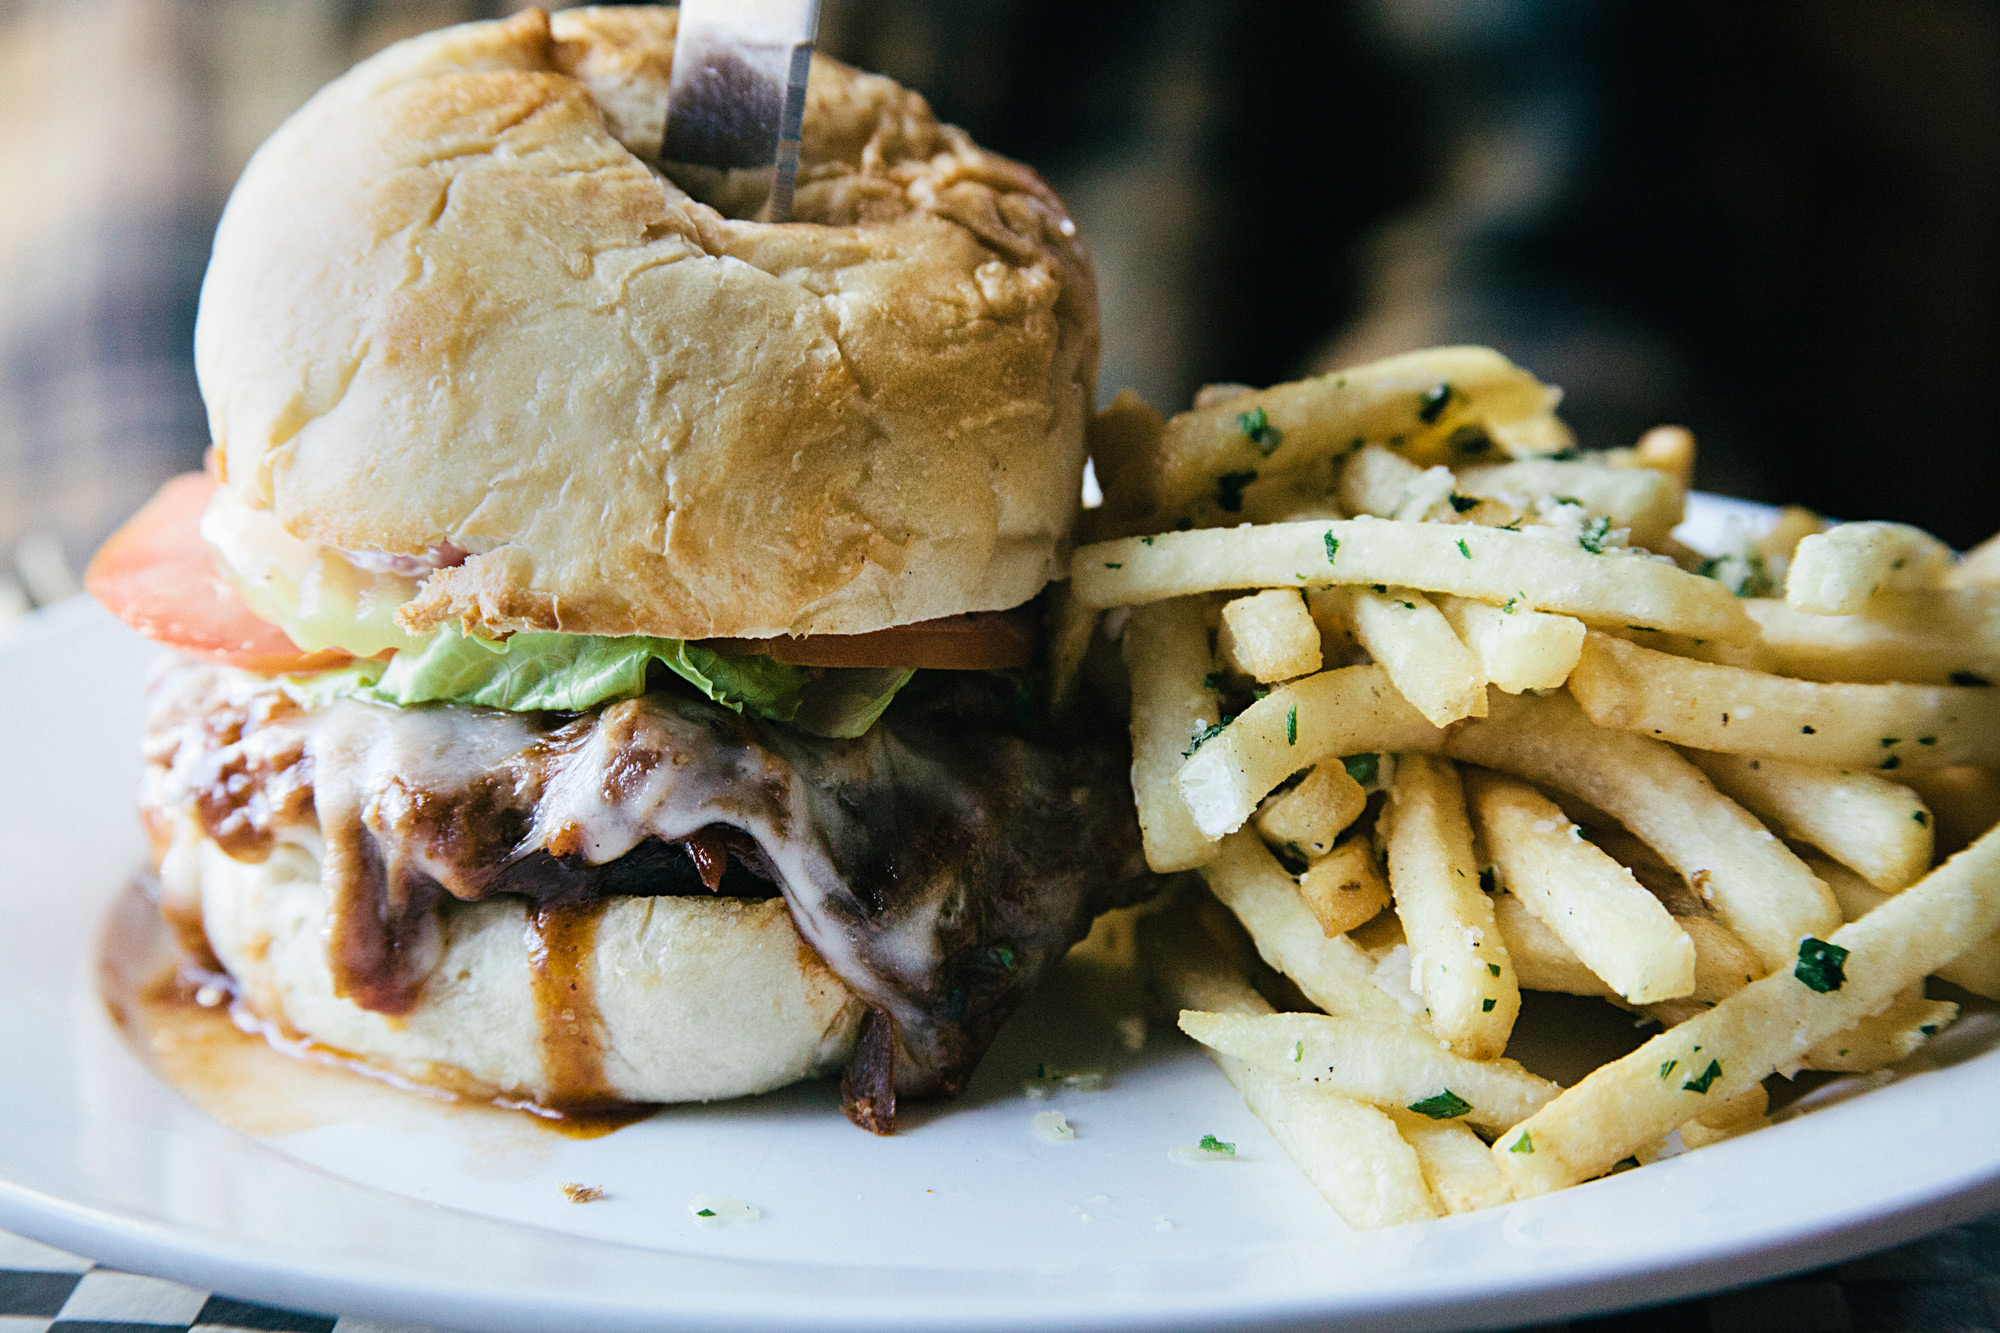 garlic-truffle-fries-pulled-pork-sandwich-lunch-sisters-oregon-cottonwood-cafe.jpg